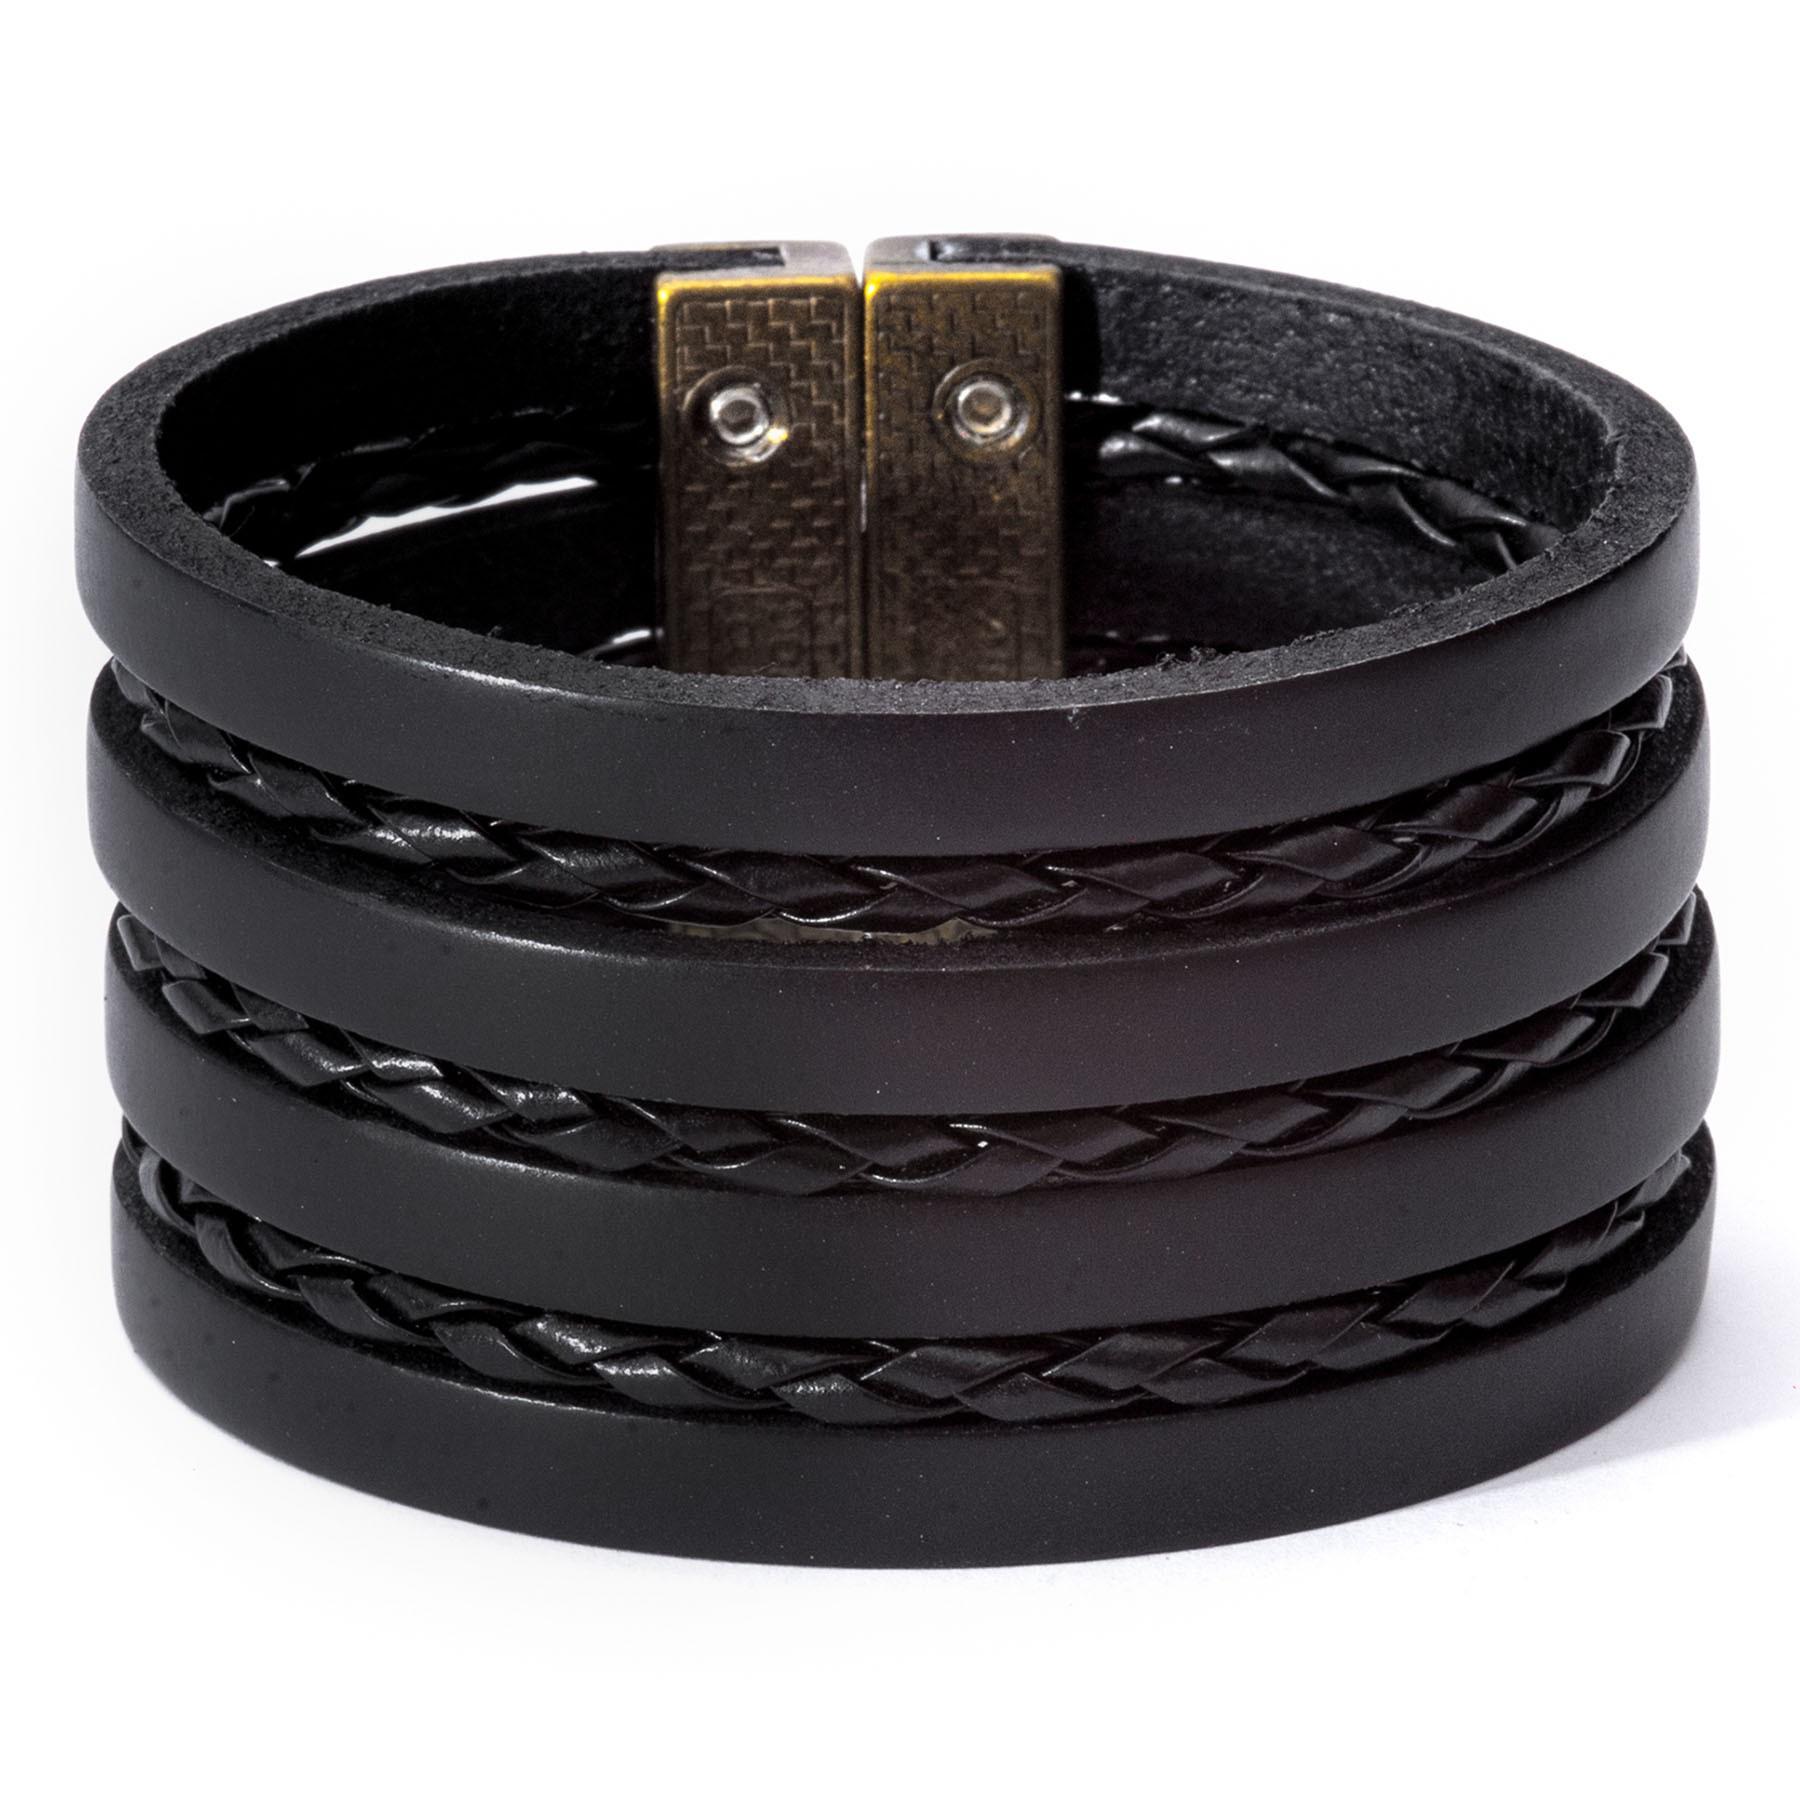 Bracelete De Couro Legítimo Preto  - Style Empório